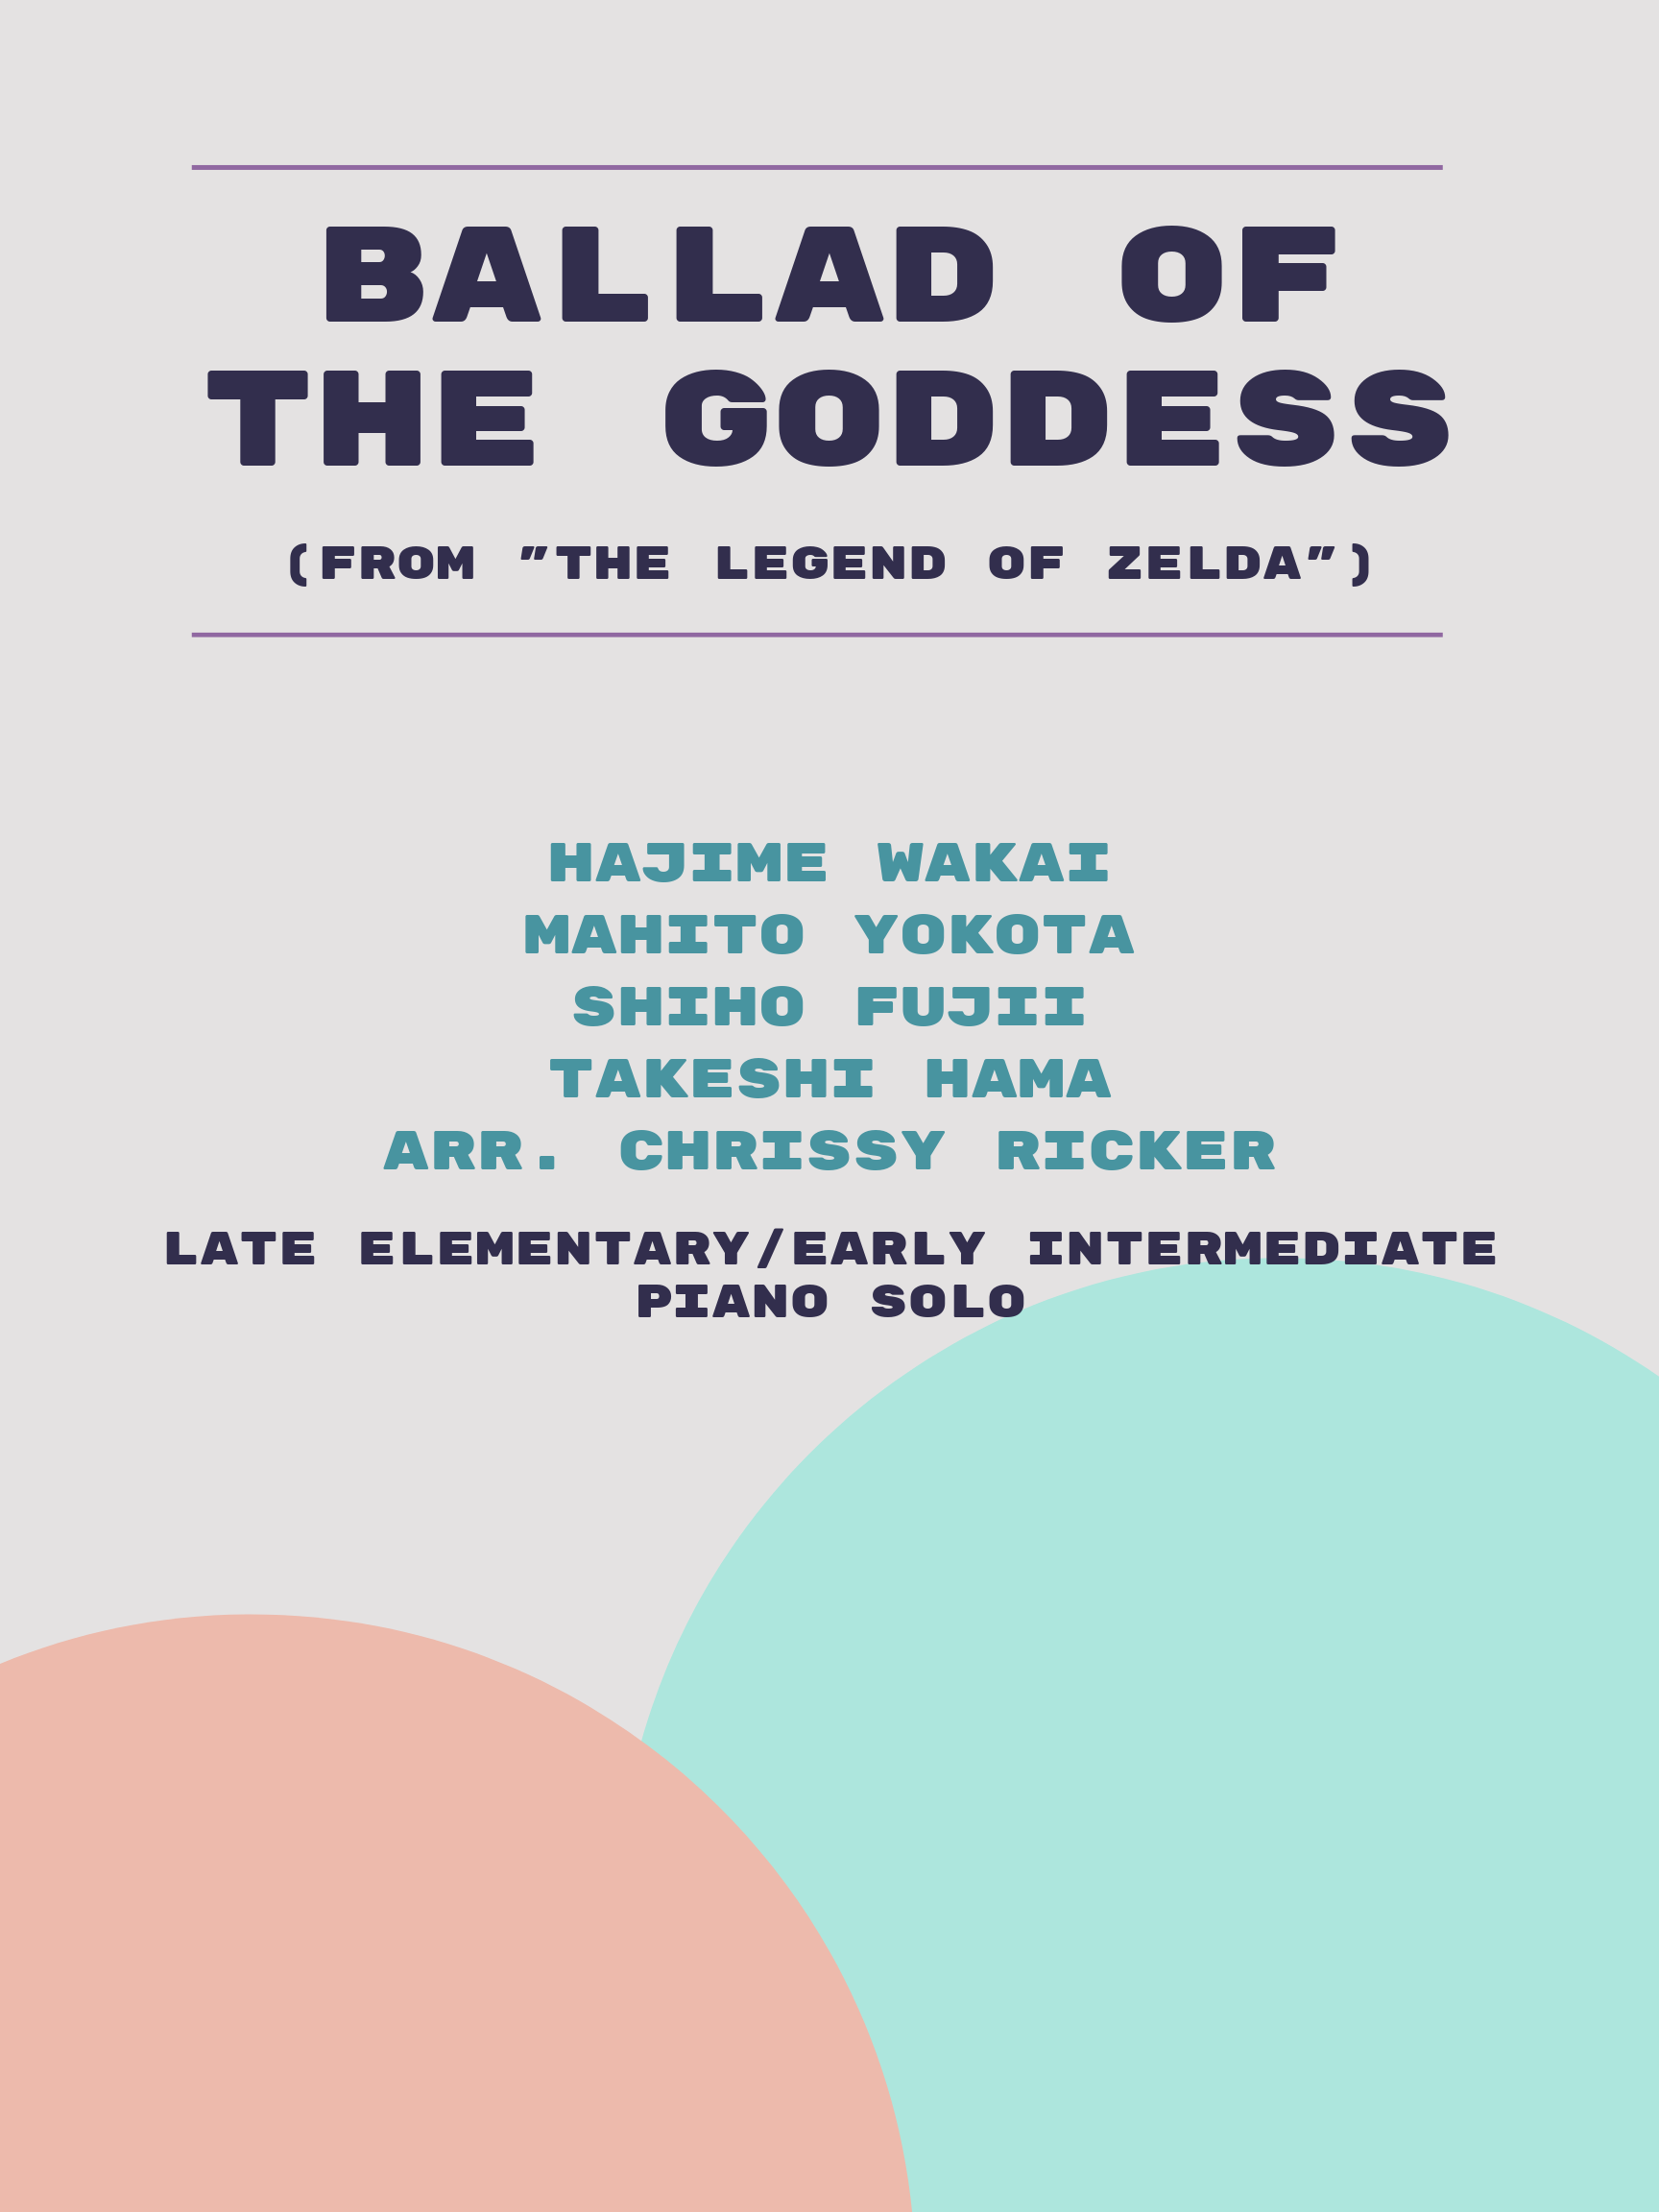 Ballad of the Goddess by Hajime Wakai, Mahito Yokota, Shiho Fujii, Takeshi Hama